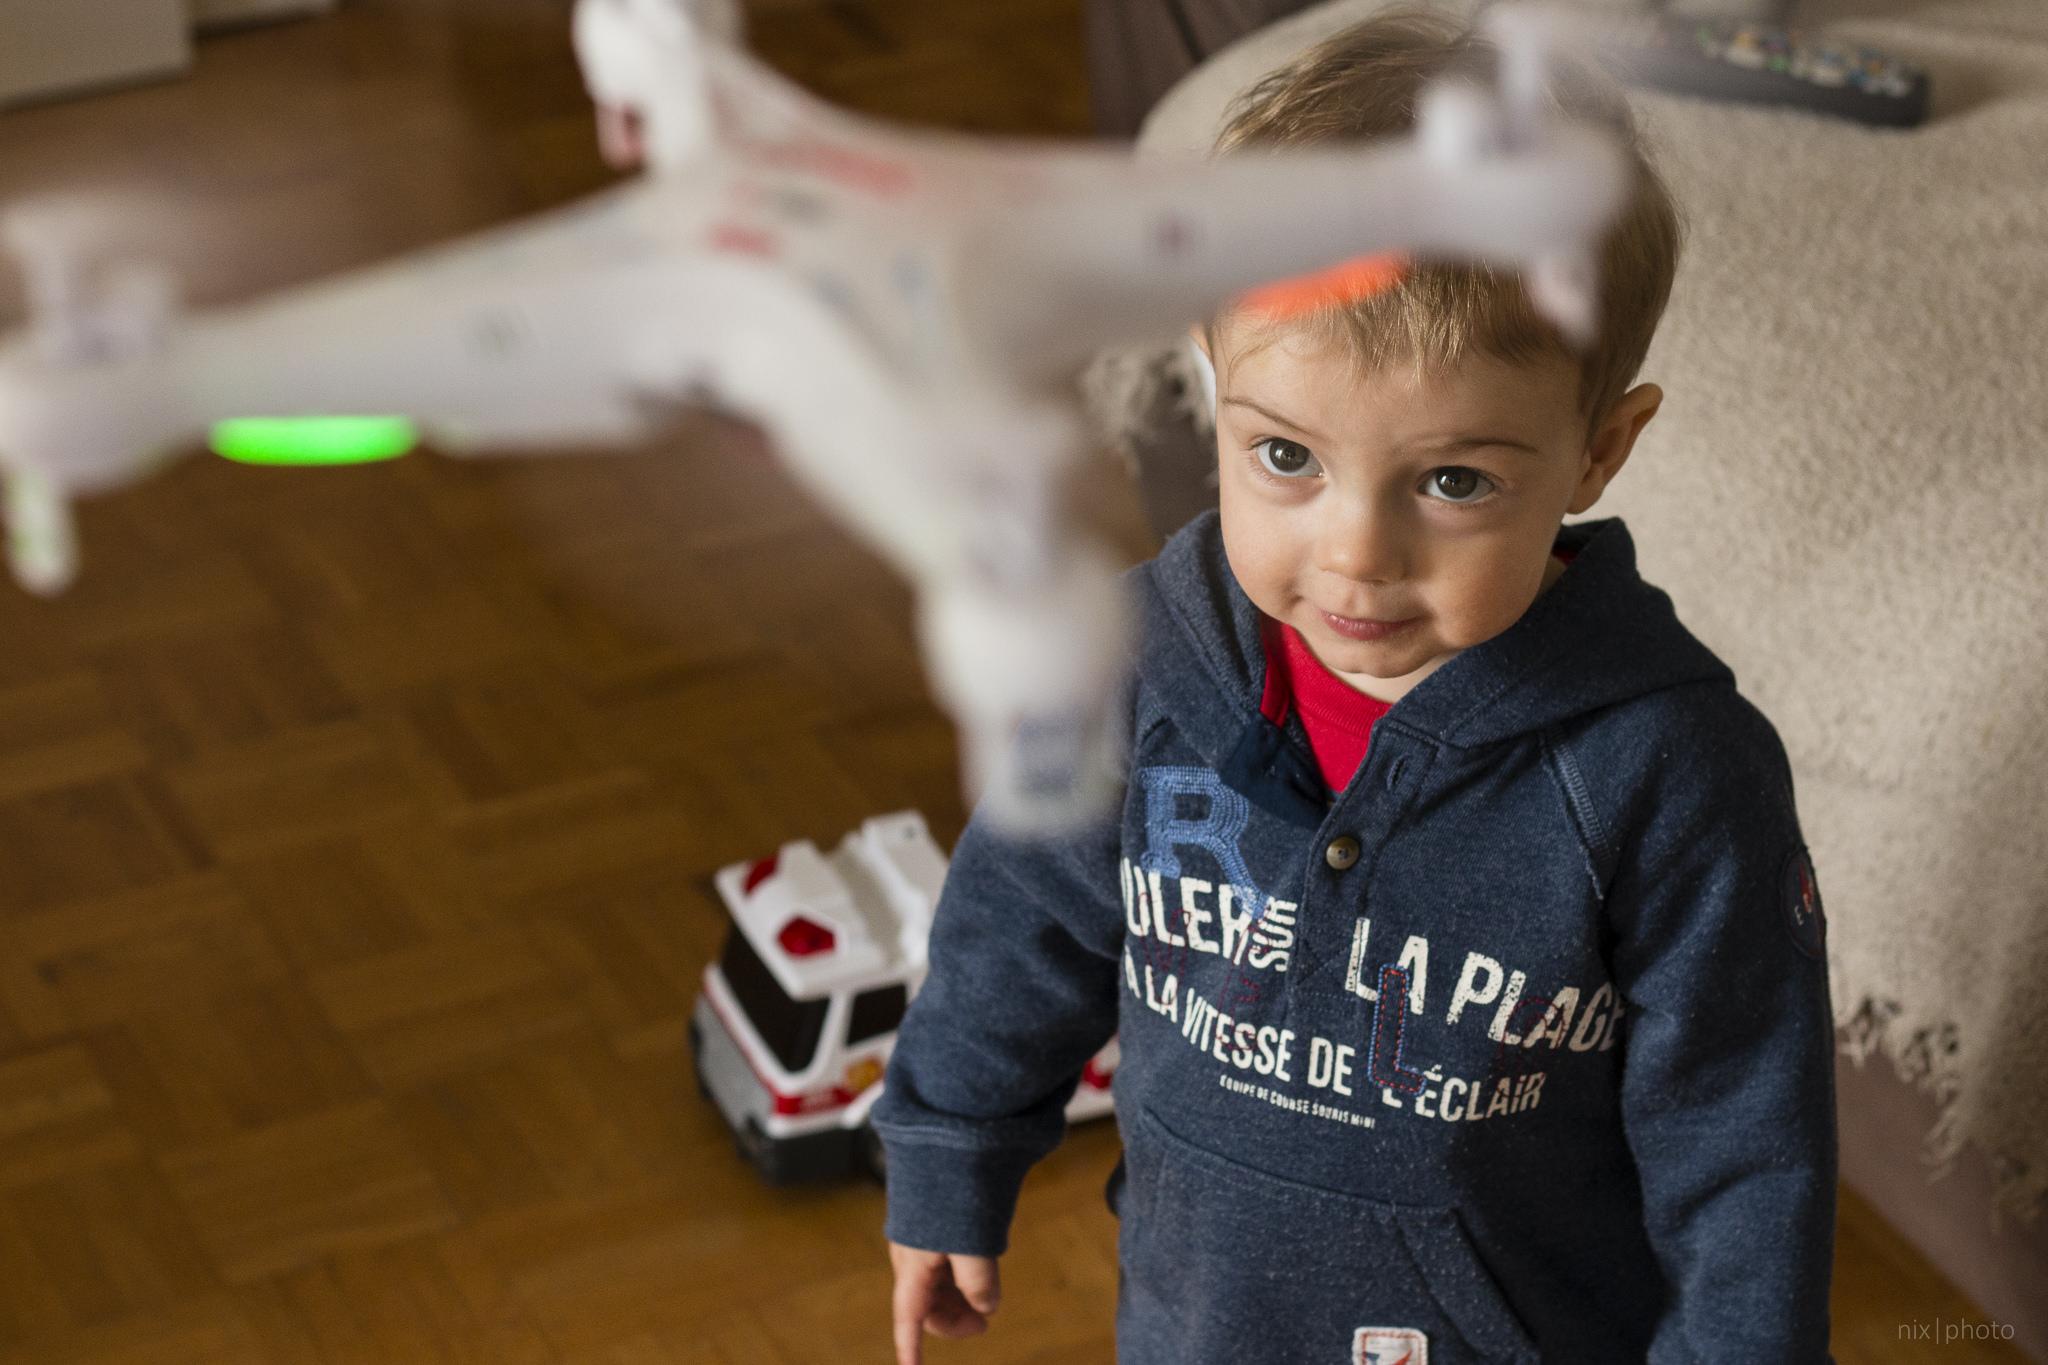 Gabriel and the drone, nicolas michaud May 22, 2015